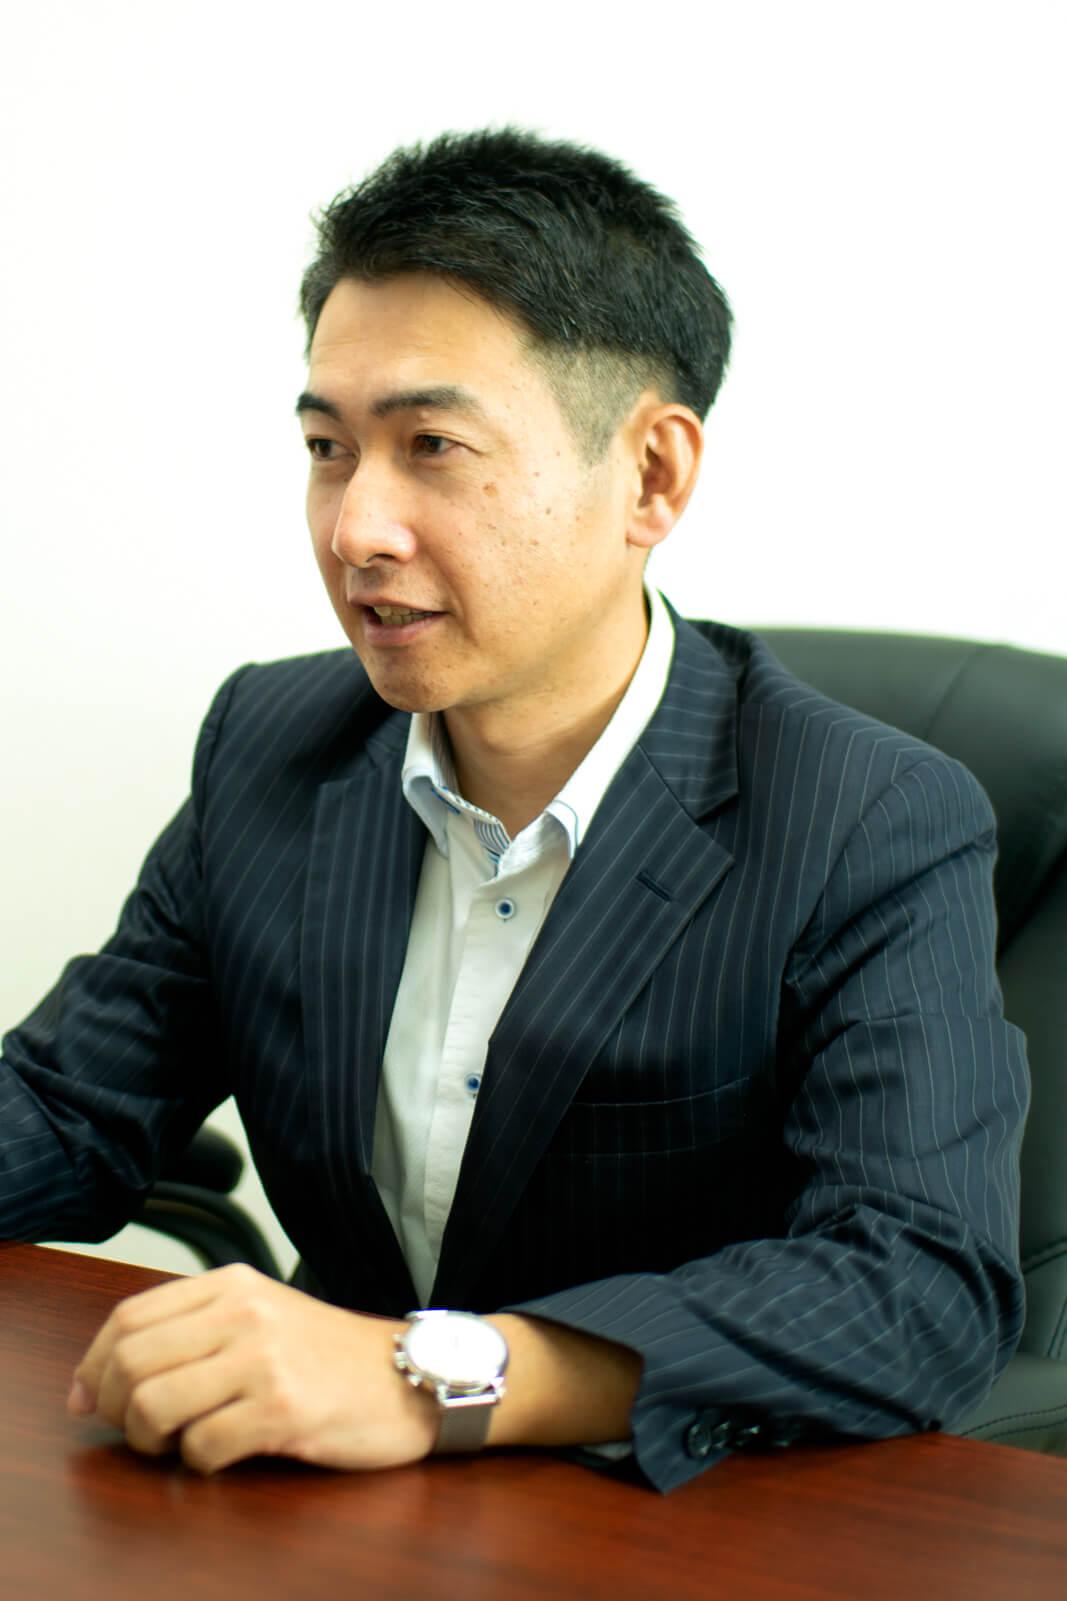 株式会社サクシード 代表取締役 水沼啓幸